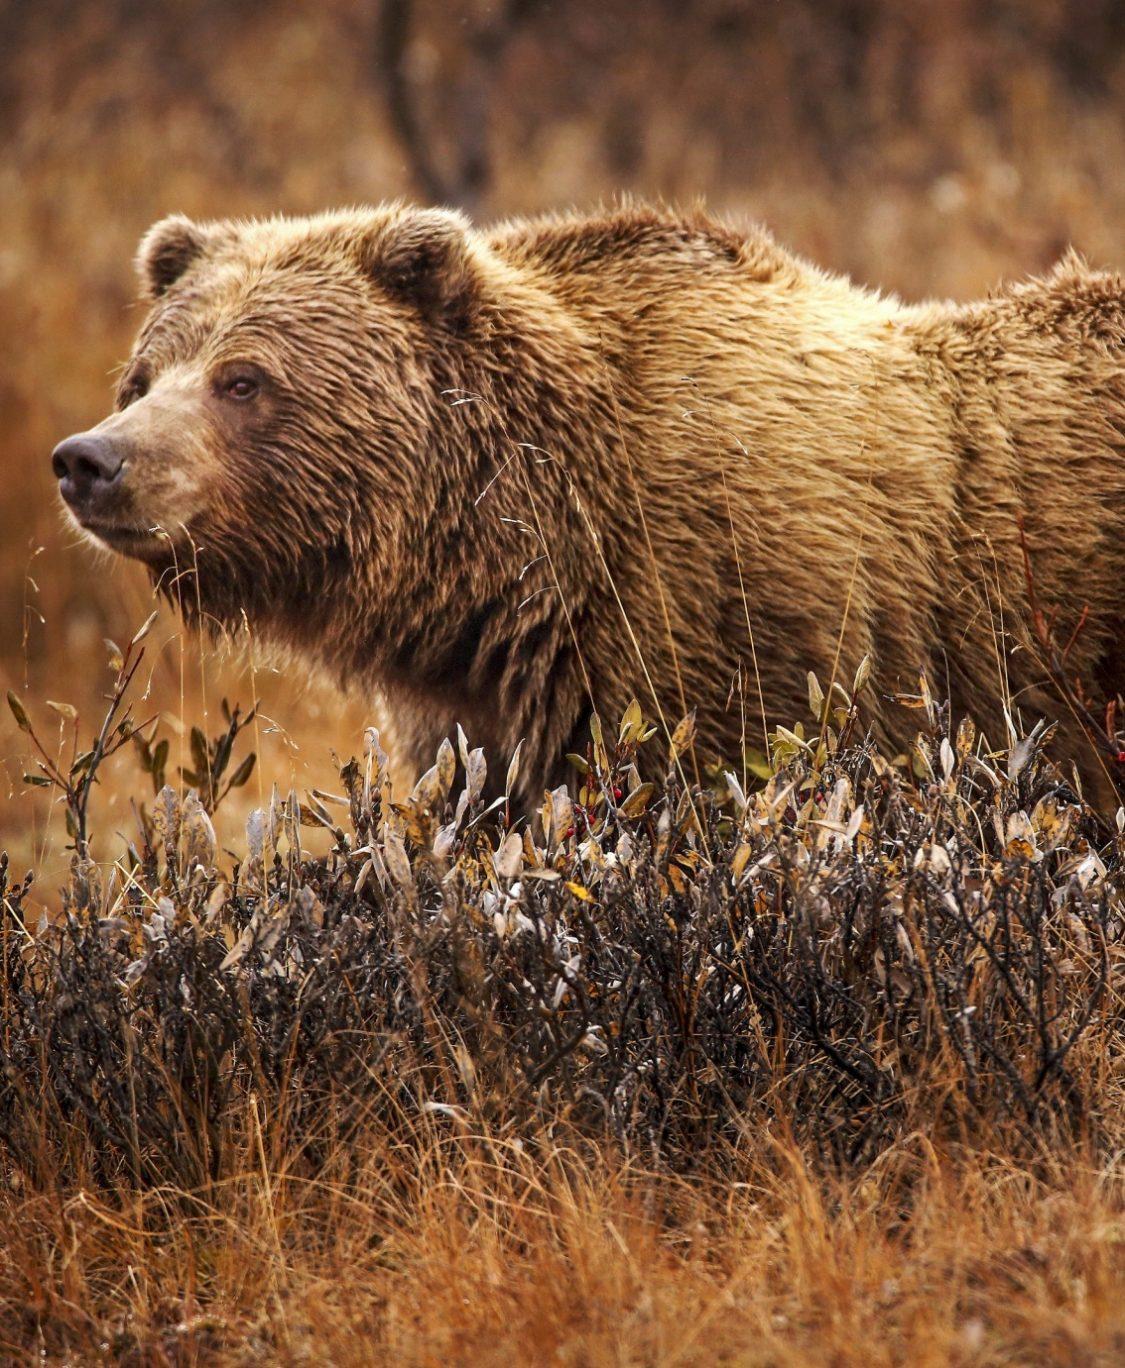 Storytime: The Bear